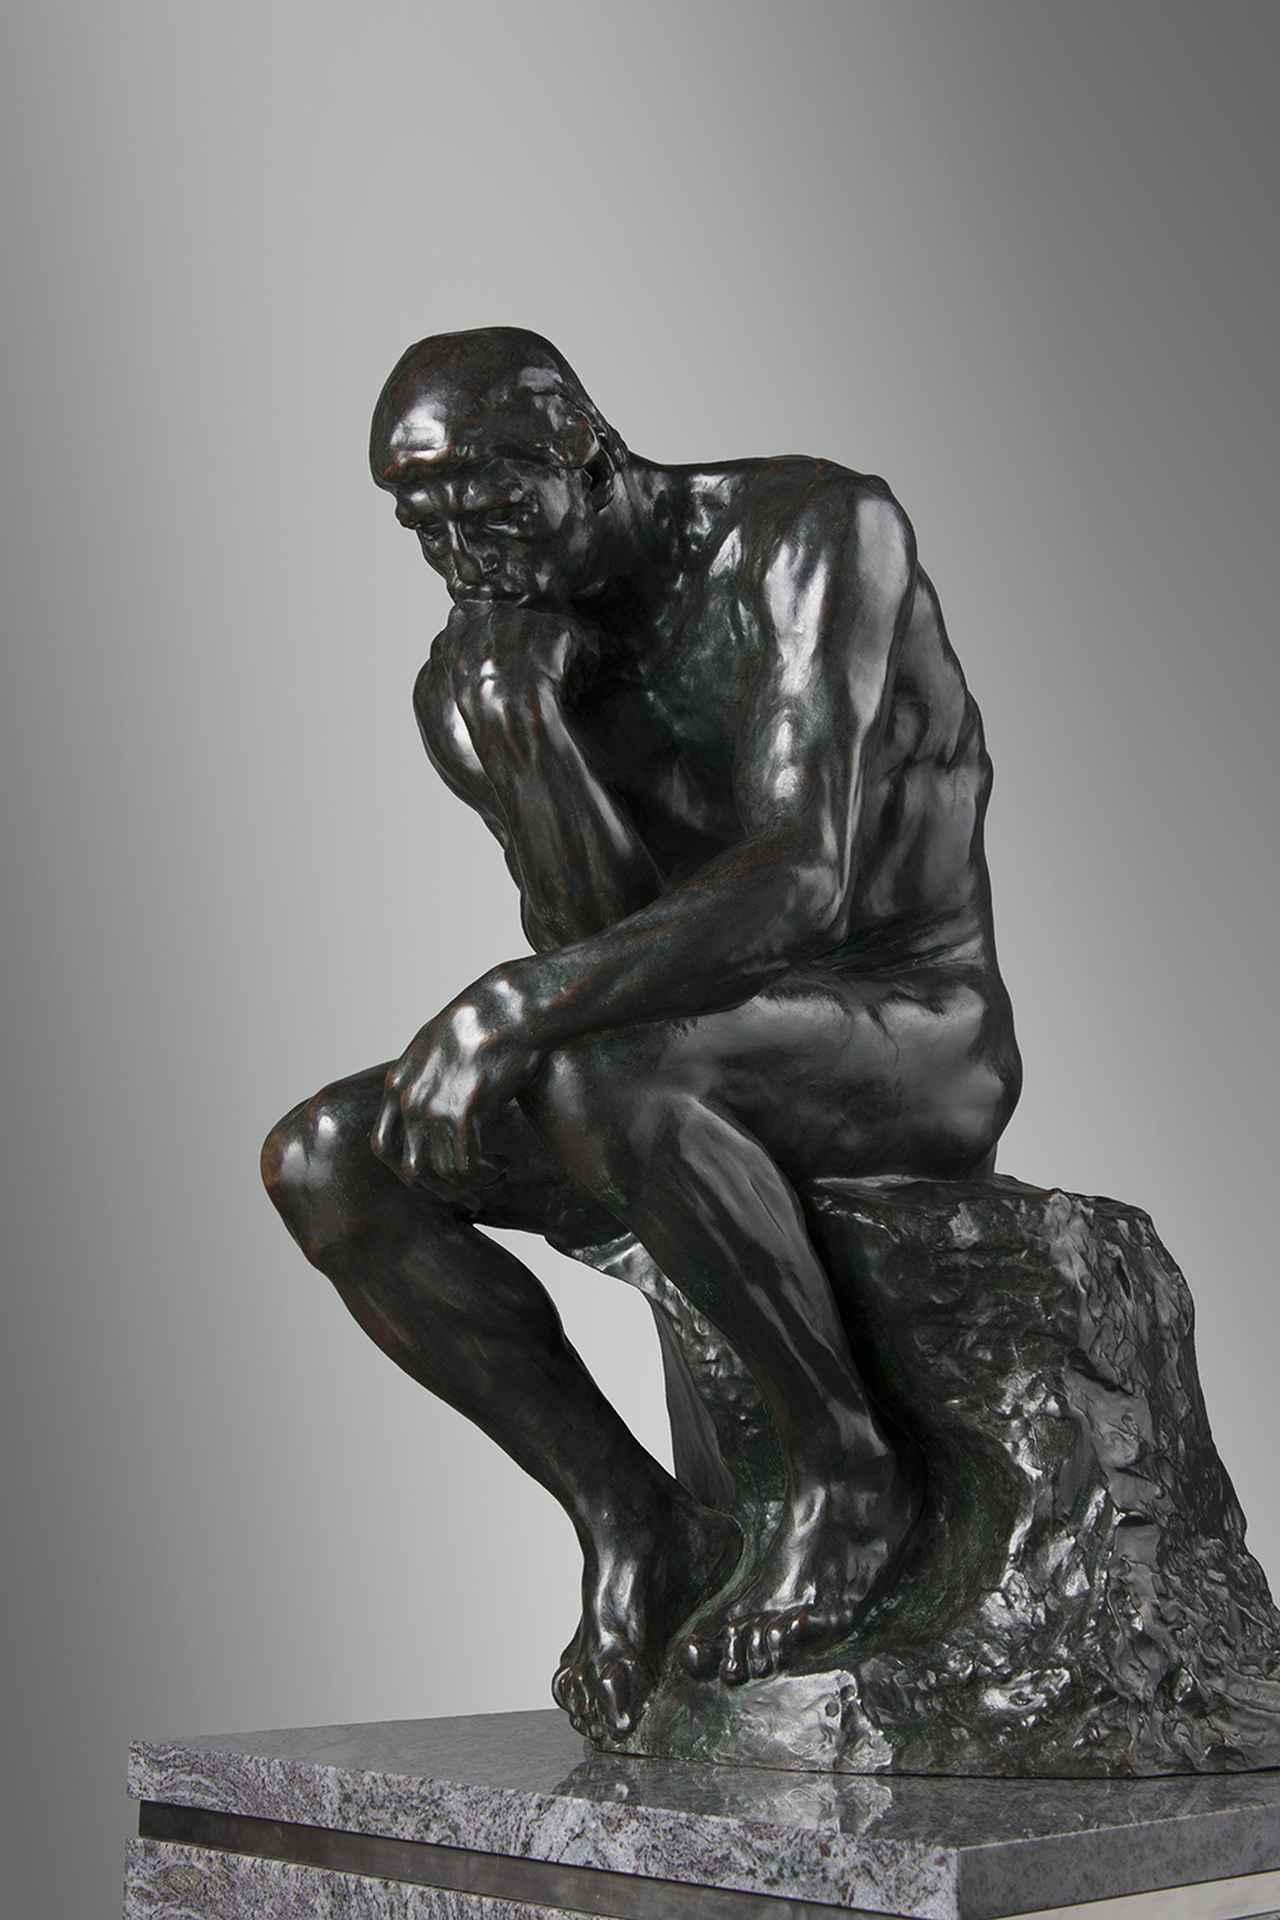 Images : 『松方コレクション展』|国立西洋美術館